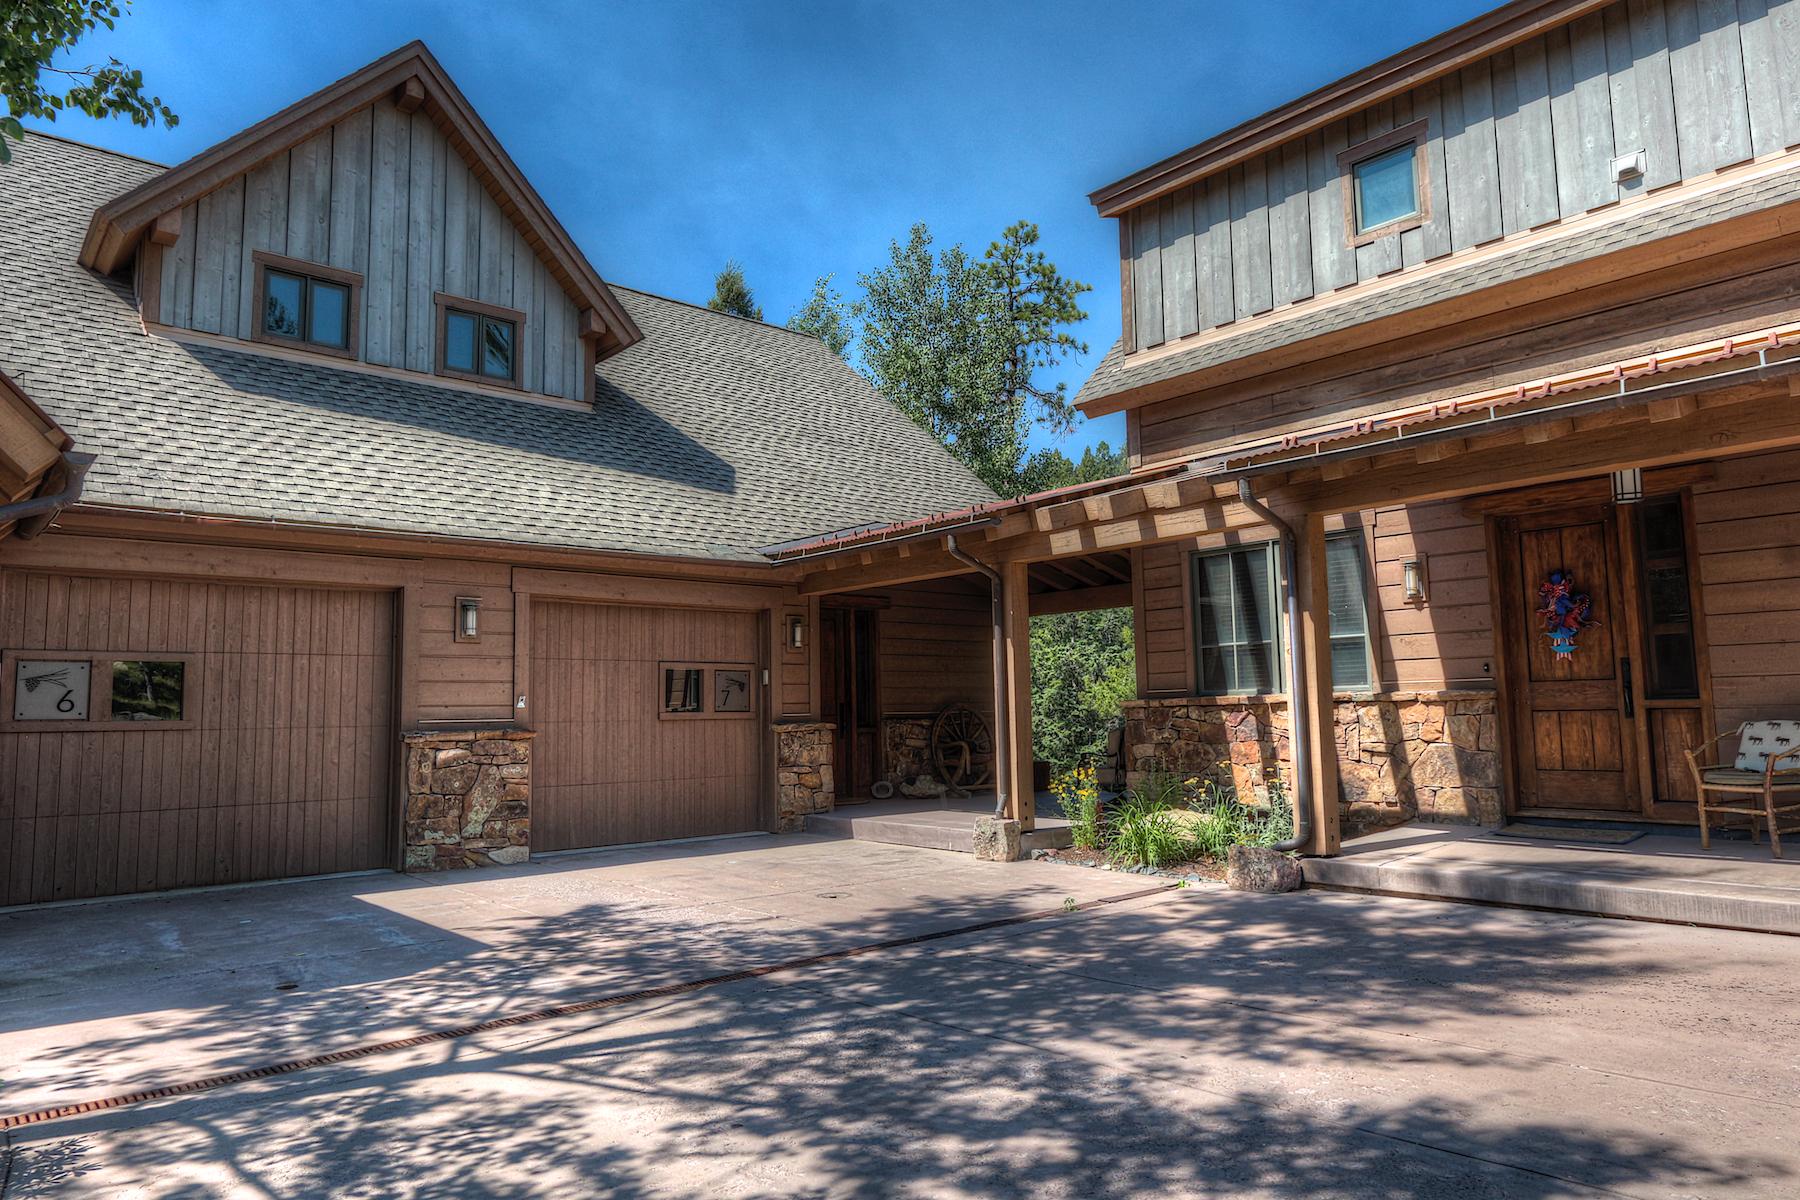 Townhouse for Sale at 590 Glacier Club Dr. #8 590 Glacier Club Drive #8 Durango, Colorado 81301 United States